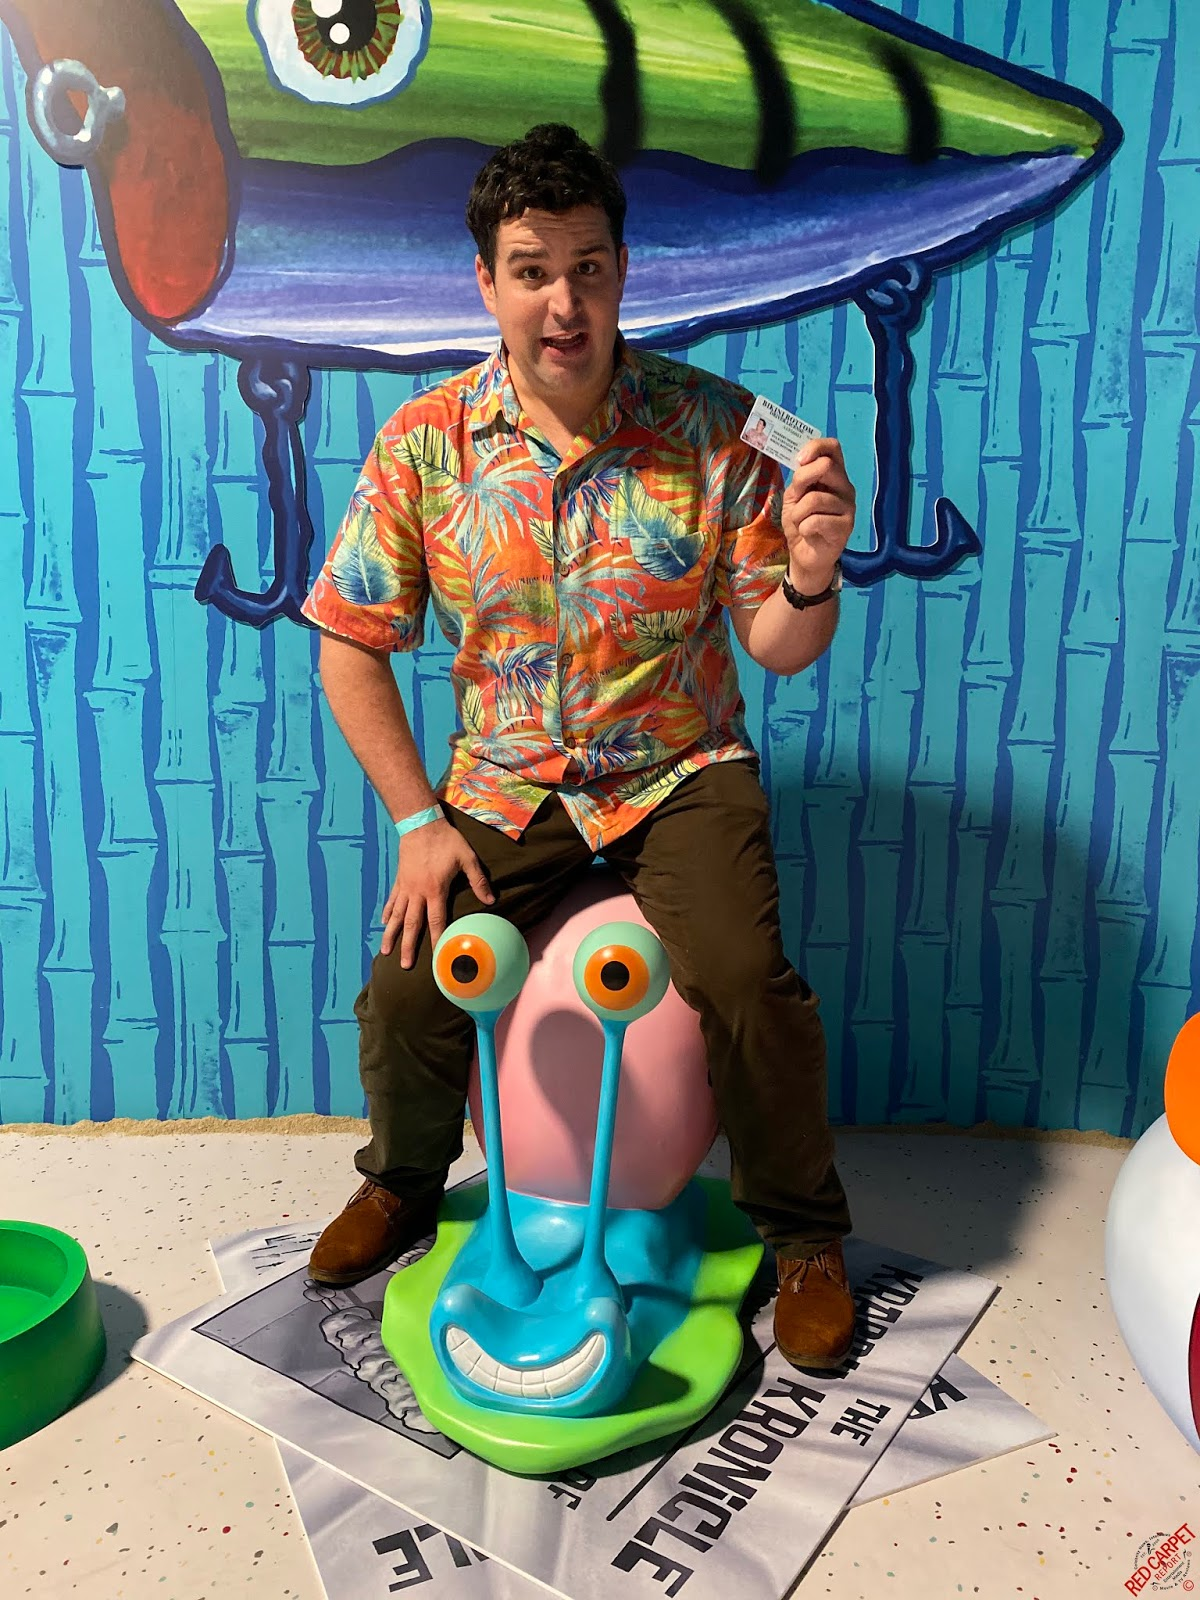 Spongebob Pop Up Los Angeles Tickets : spongebob, angeles, tickets, NickALive!:, Nickelodeon, Announces, 'SpongeBob, SquarePants:, Bikini, Bottom, Experience', Pop-Up;, October